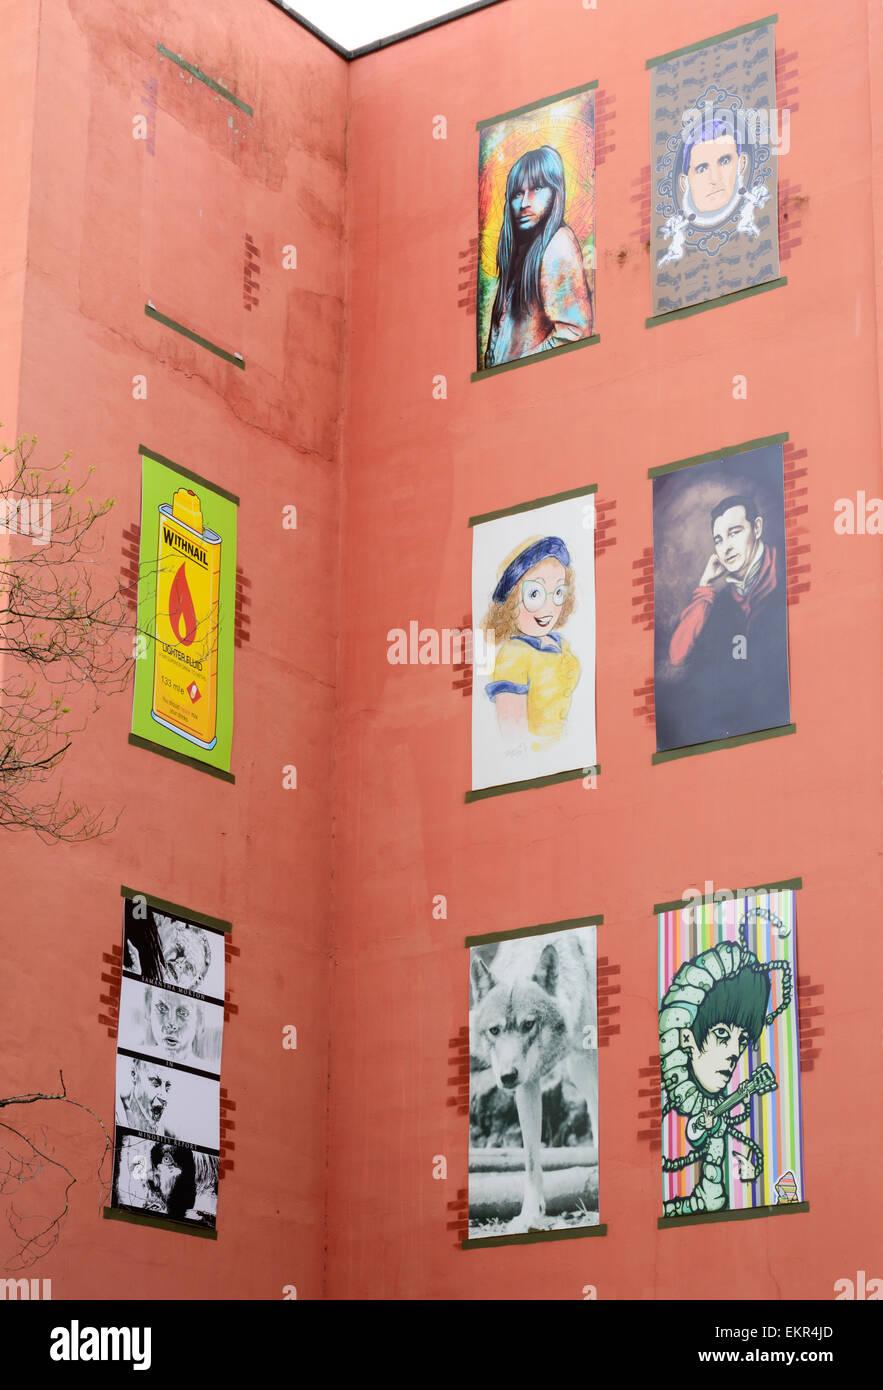 Art installation in the creative quarter of Nottingham -Lace market area. Featuring Brian Clough, Sue Pollard, & - Stock Image